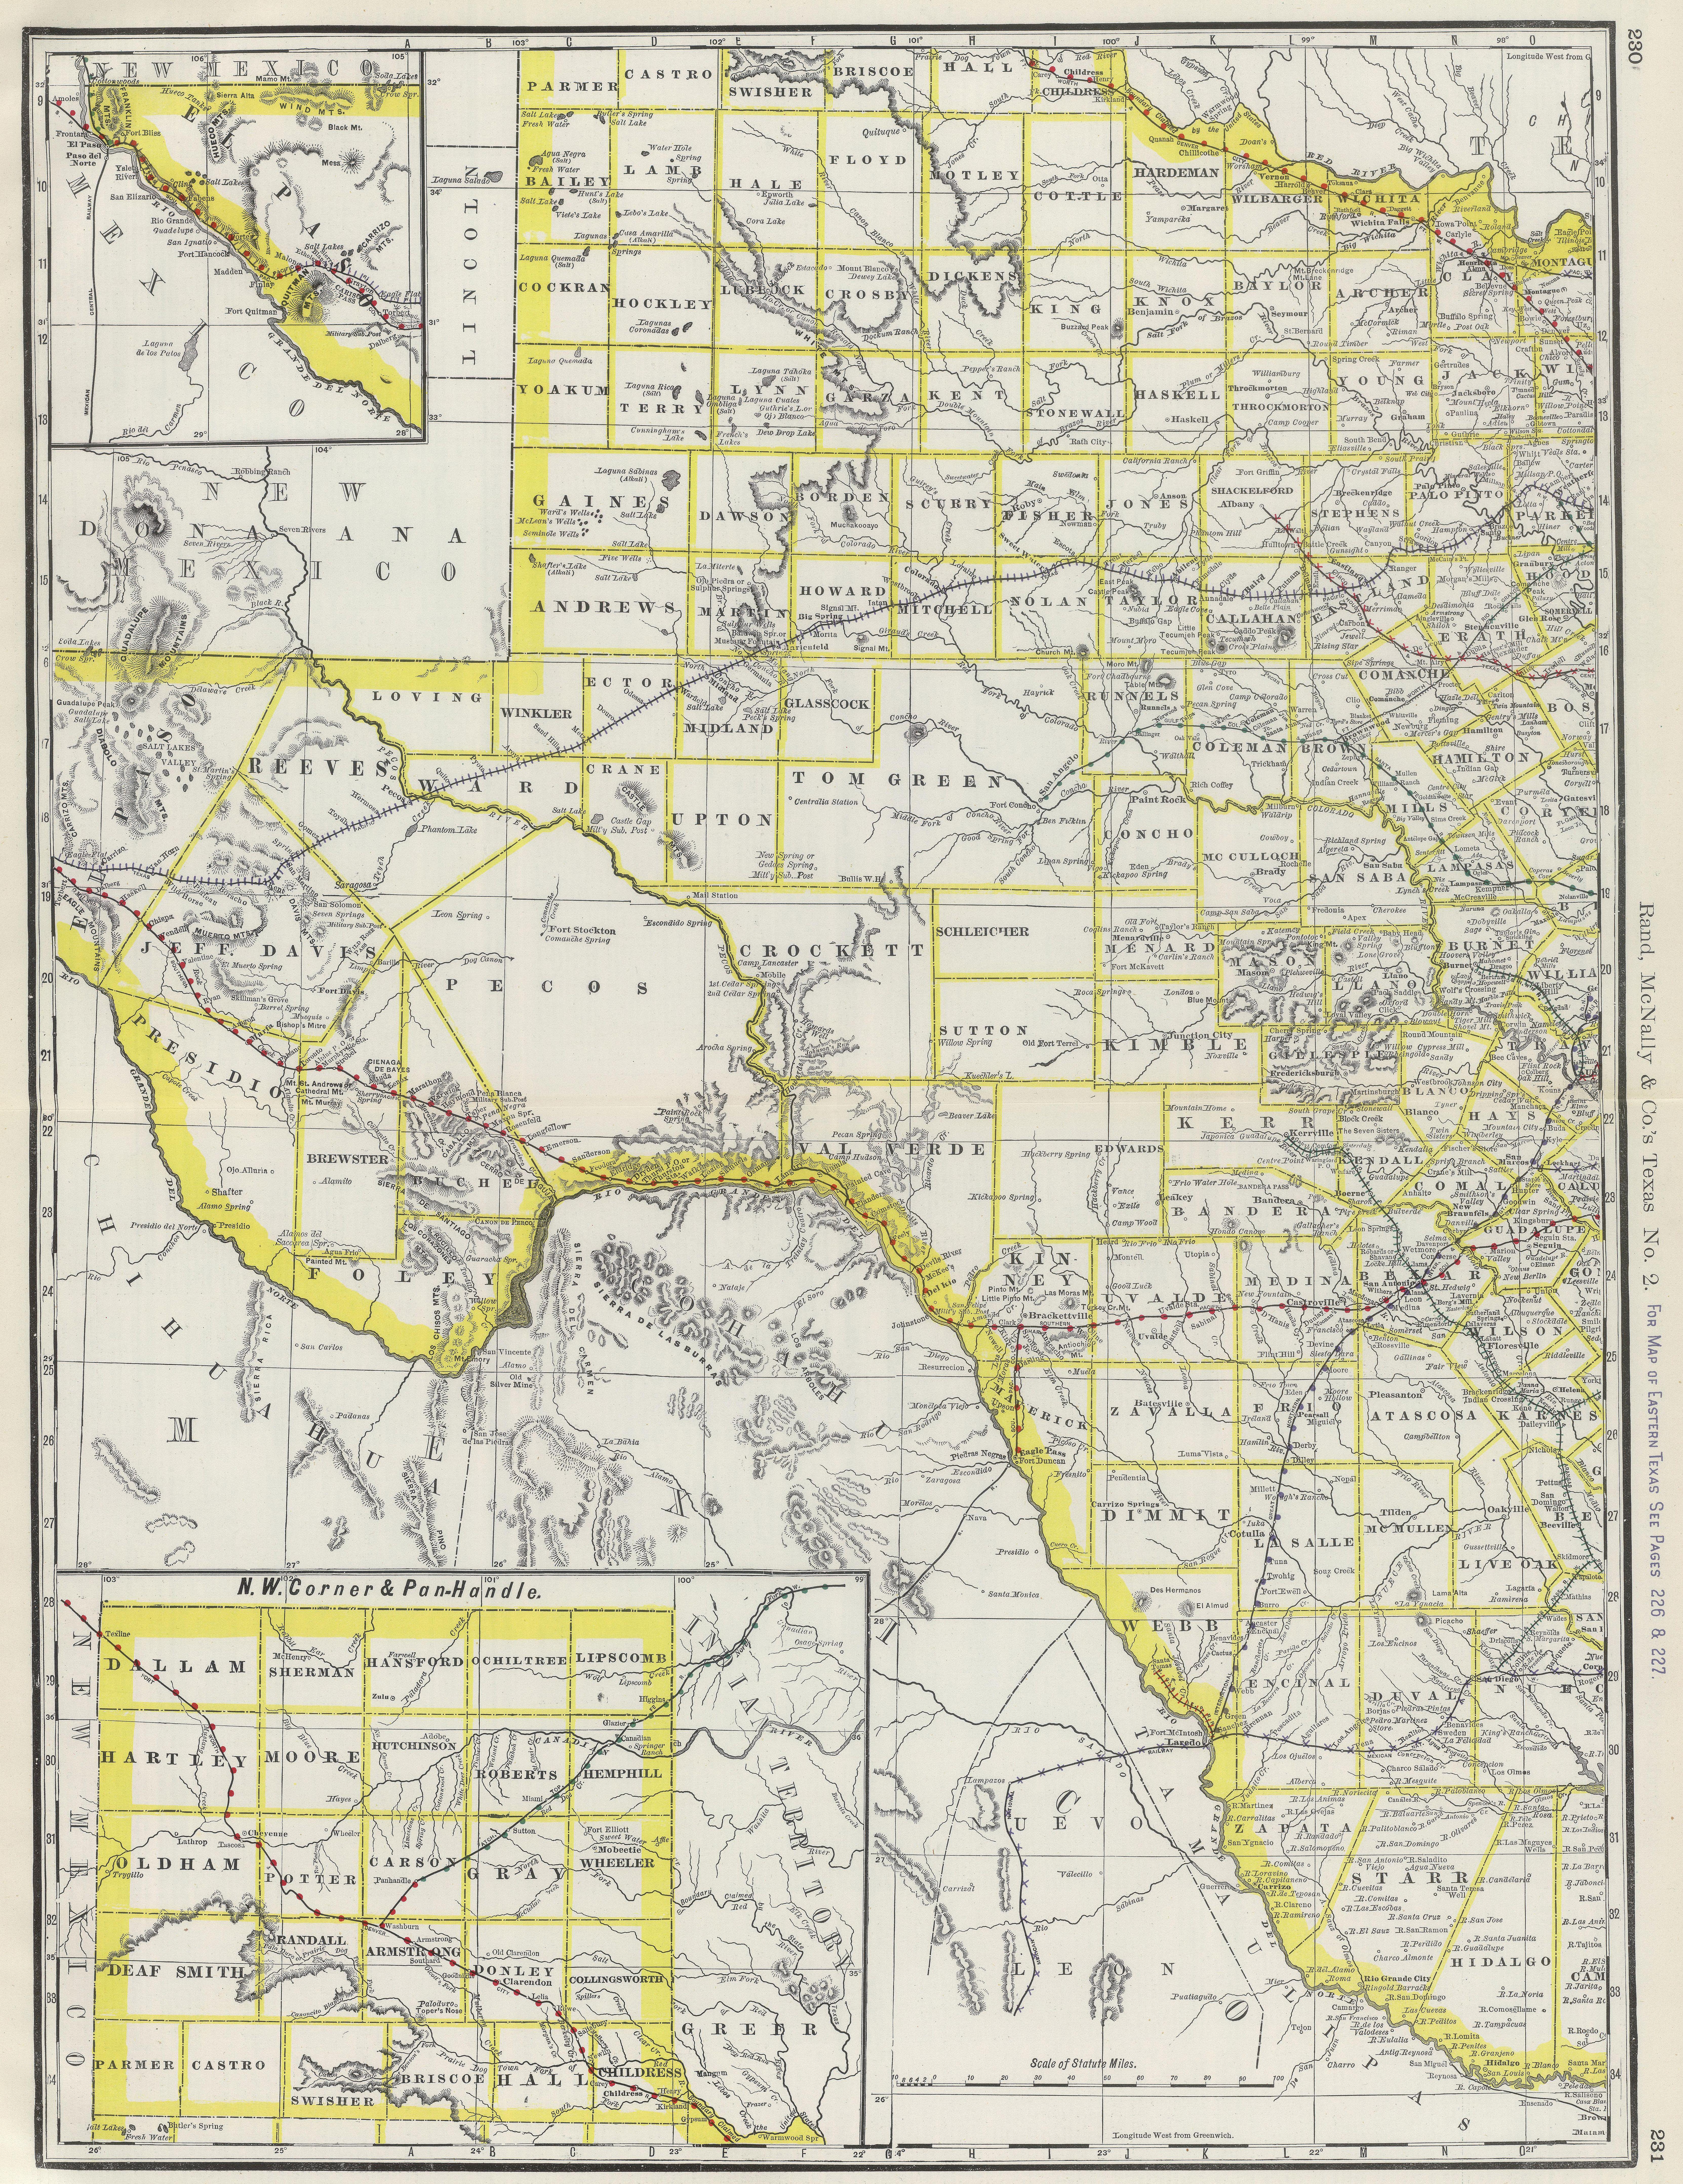 Map Of Western Texas.1888 Map Of Western Texas 6647 8626 Oldmaps